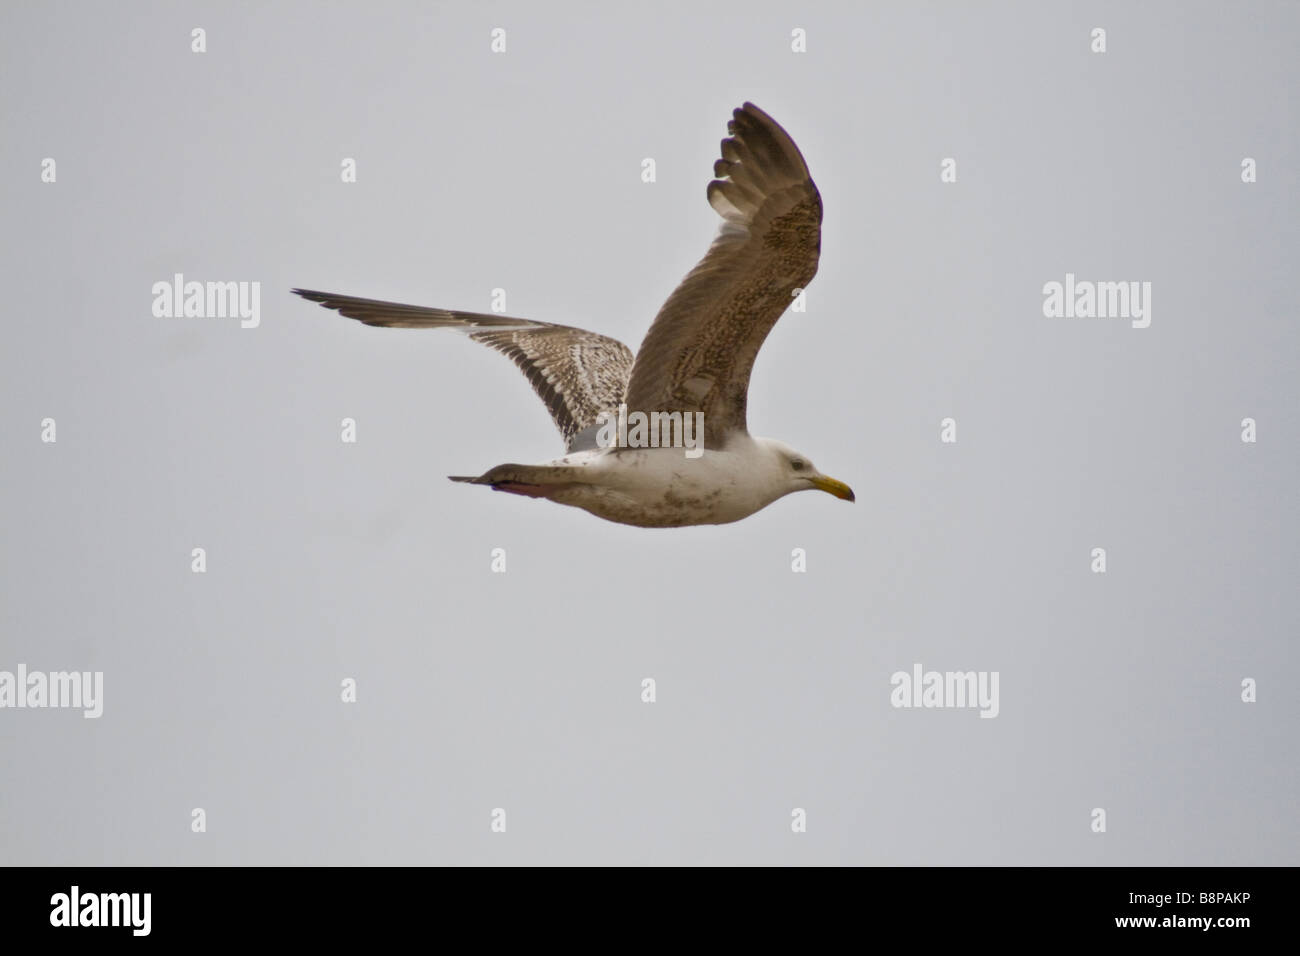 Gull in flight - Stock Image